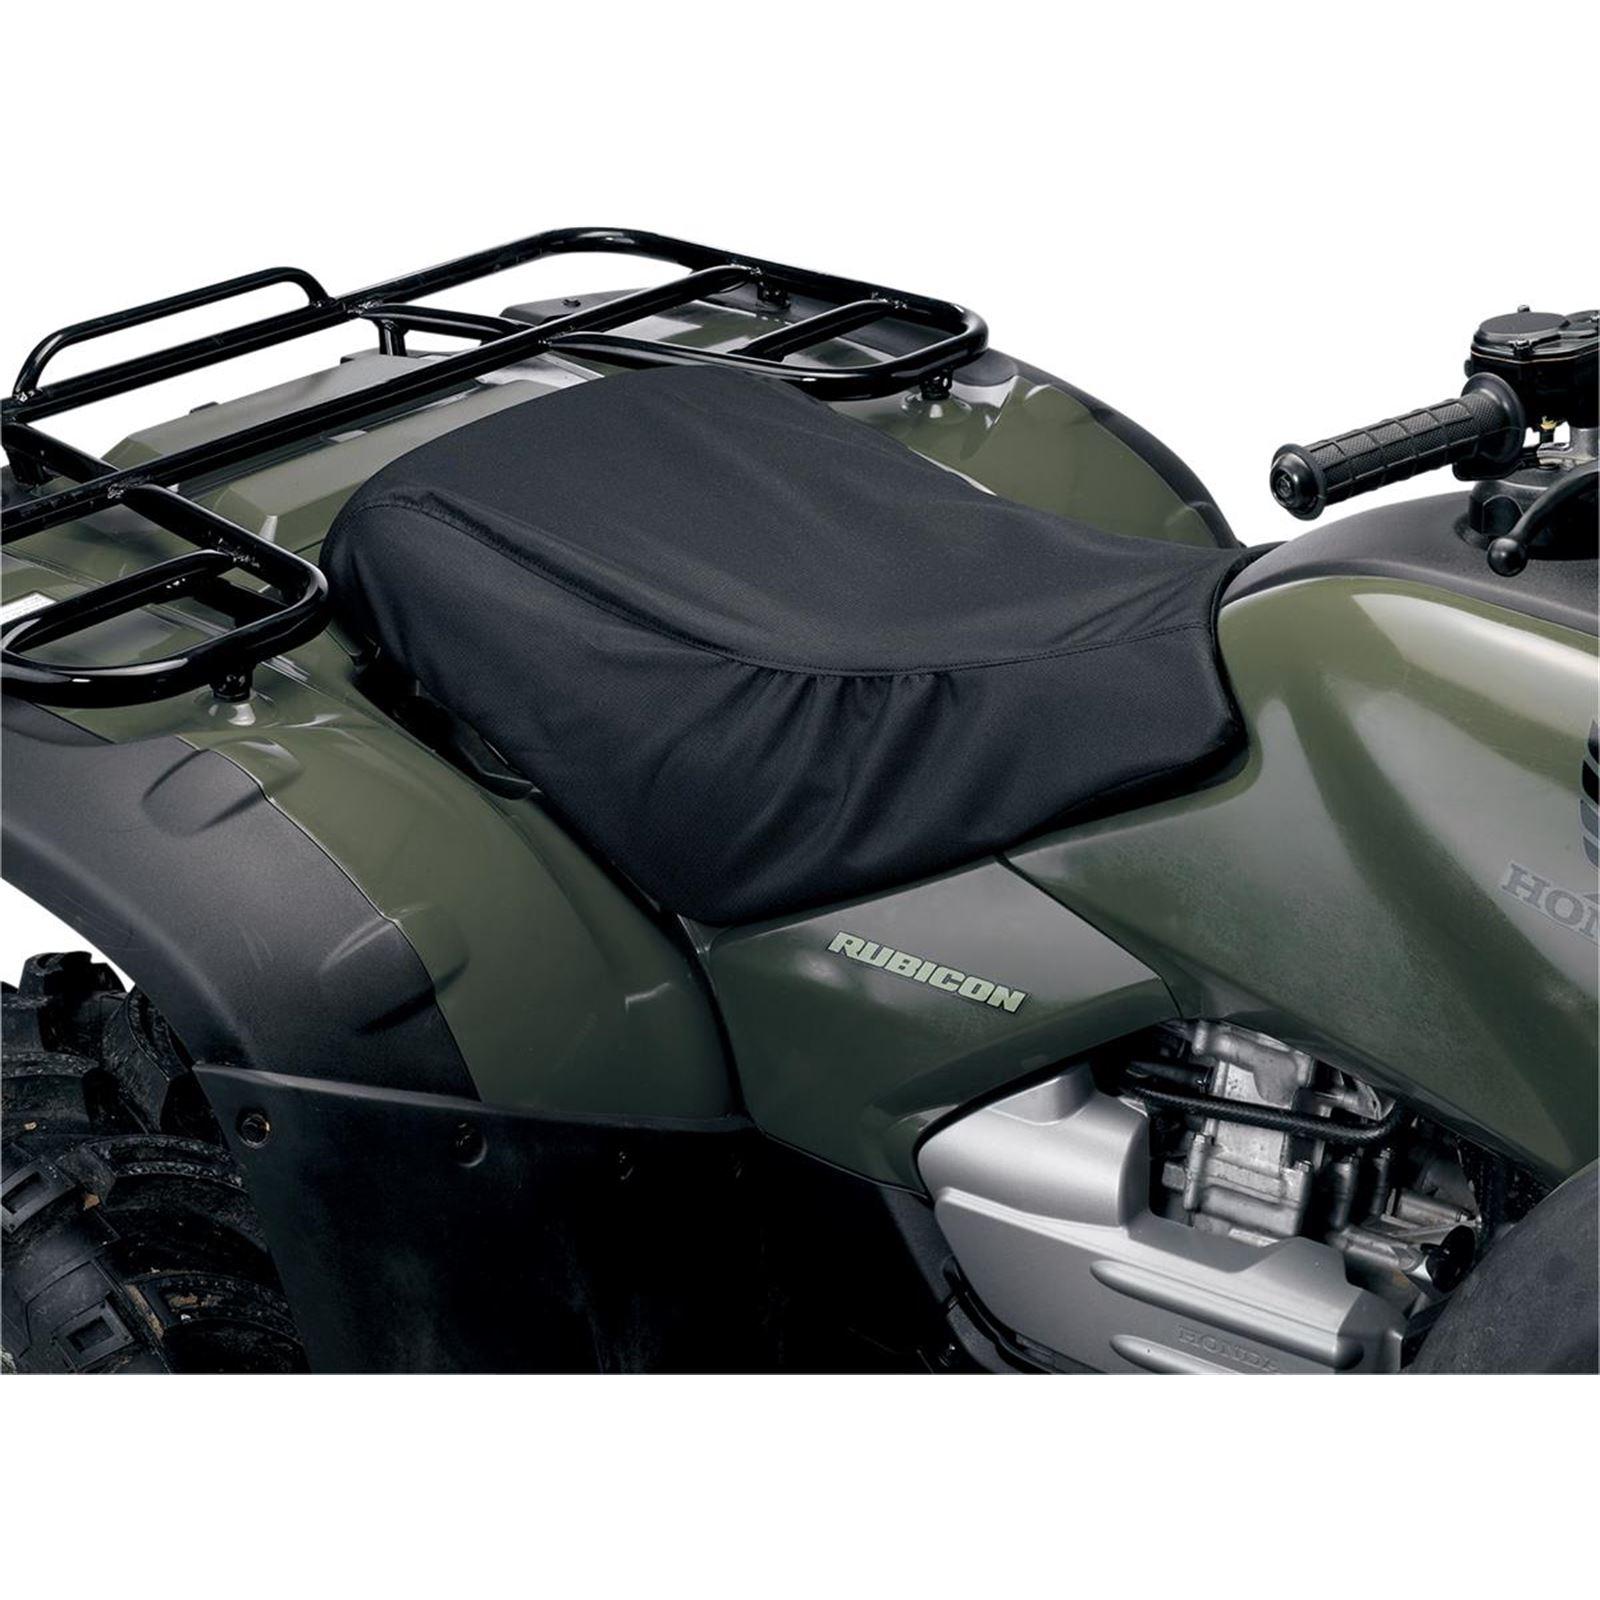 Moose Seat Cover - Black - Rubicon